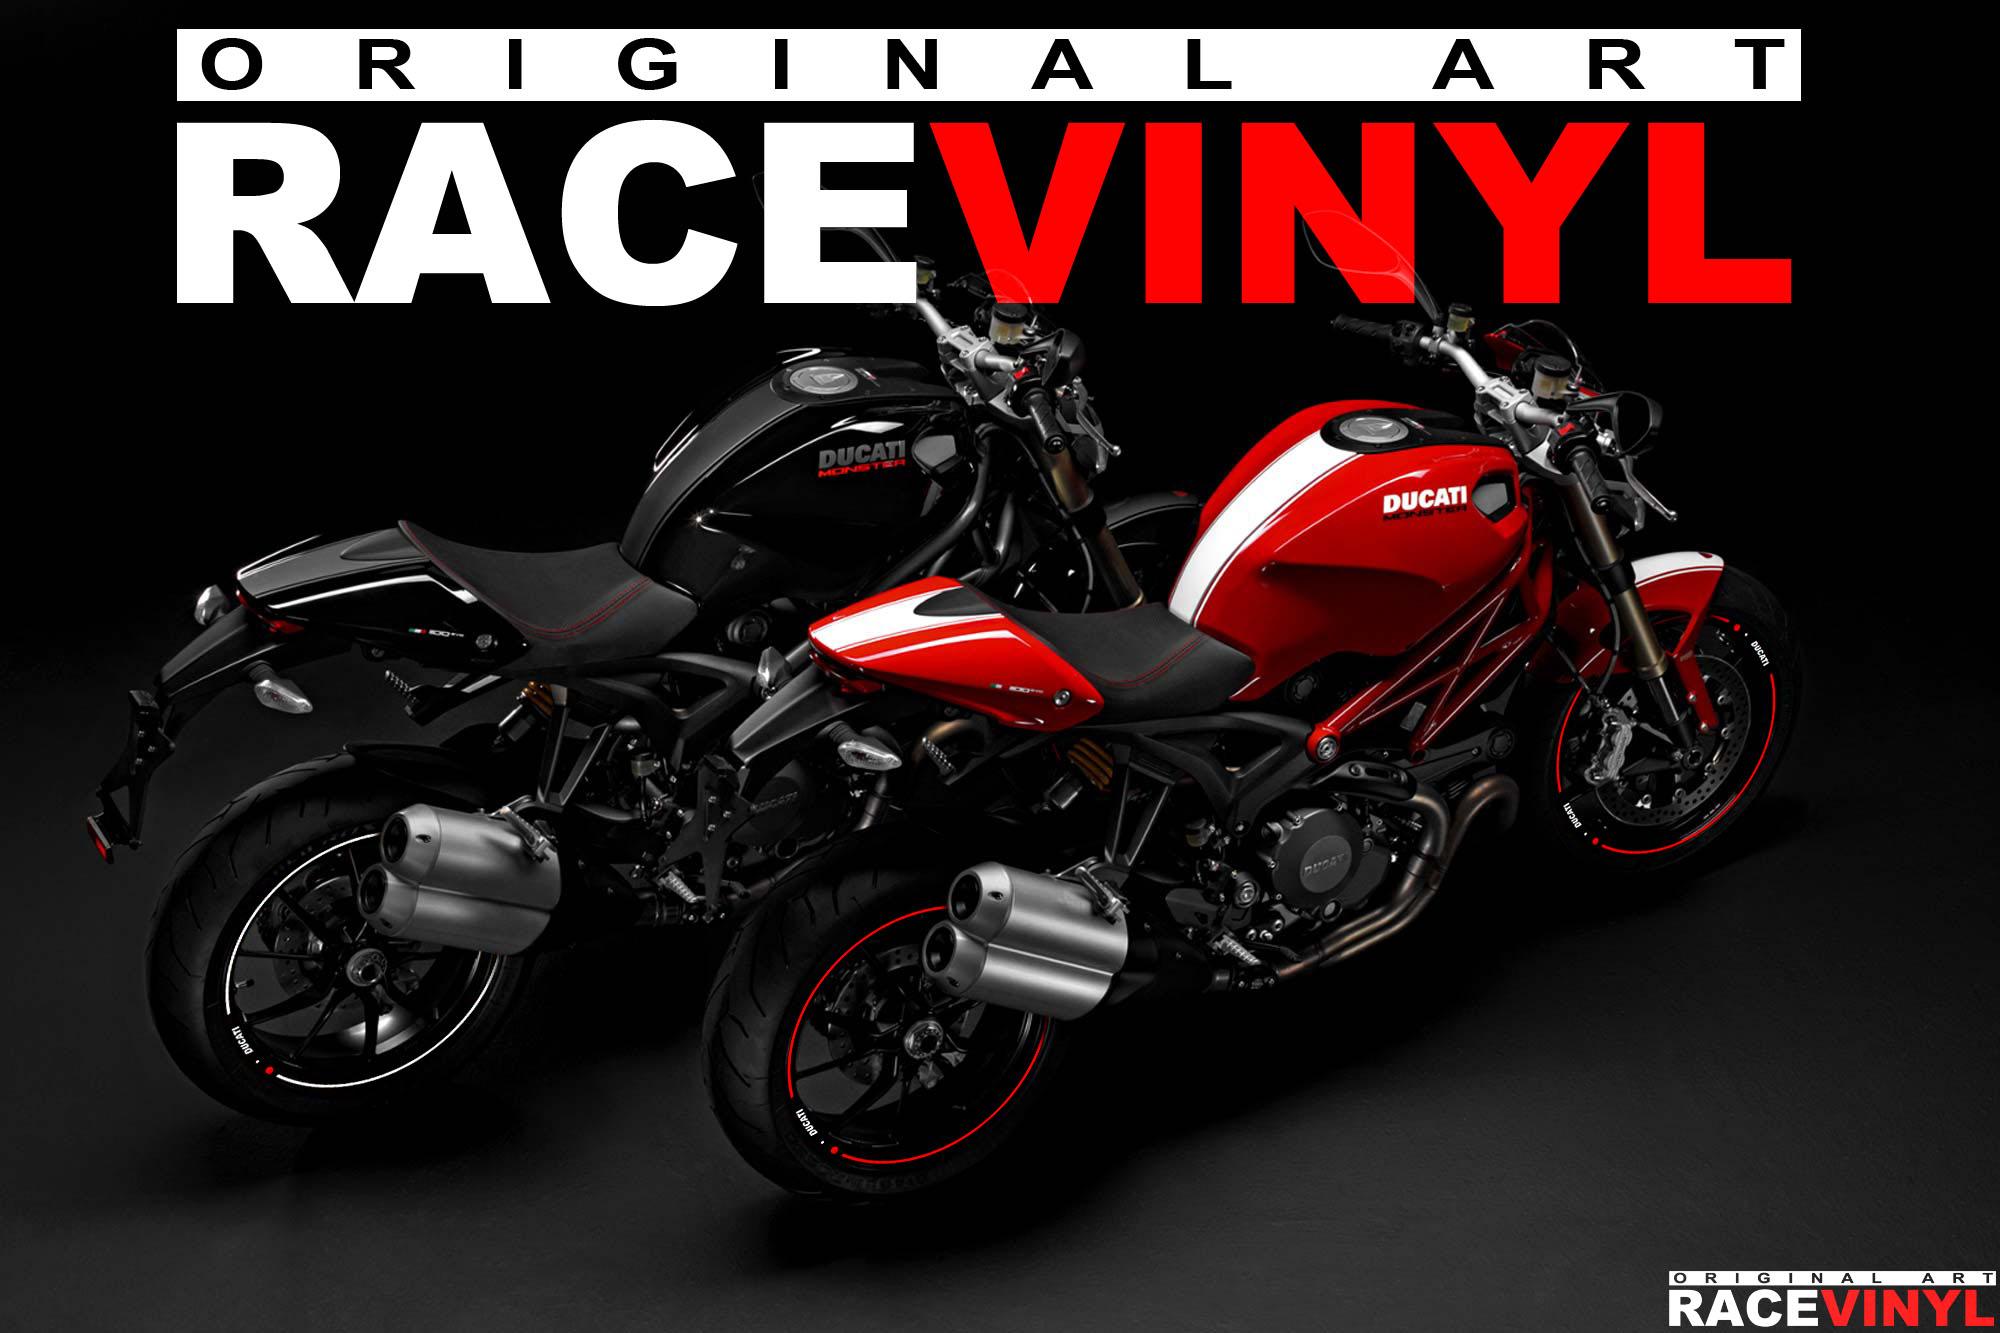 Racevinyl-Ducati-Monster-400-620-696-659-750-796-800-900-s2r-s4r-1000-1100-s-r-ie-evo-1200-pegatina-adhesivo-rueda-llanta-vinilo-rim-sticker-stripe-vinyl-wheel-03.jpg